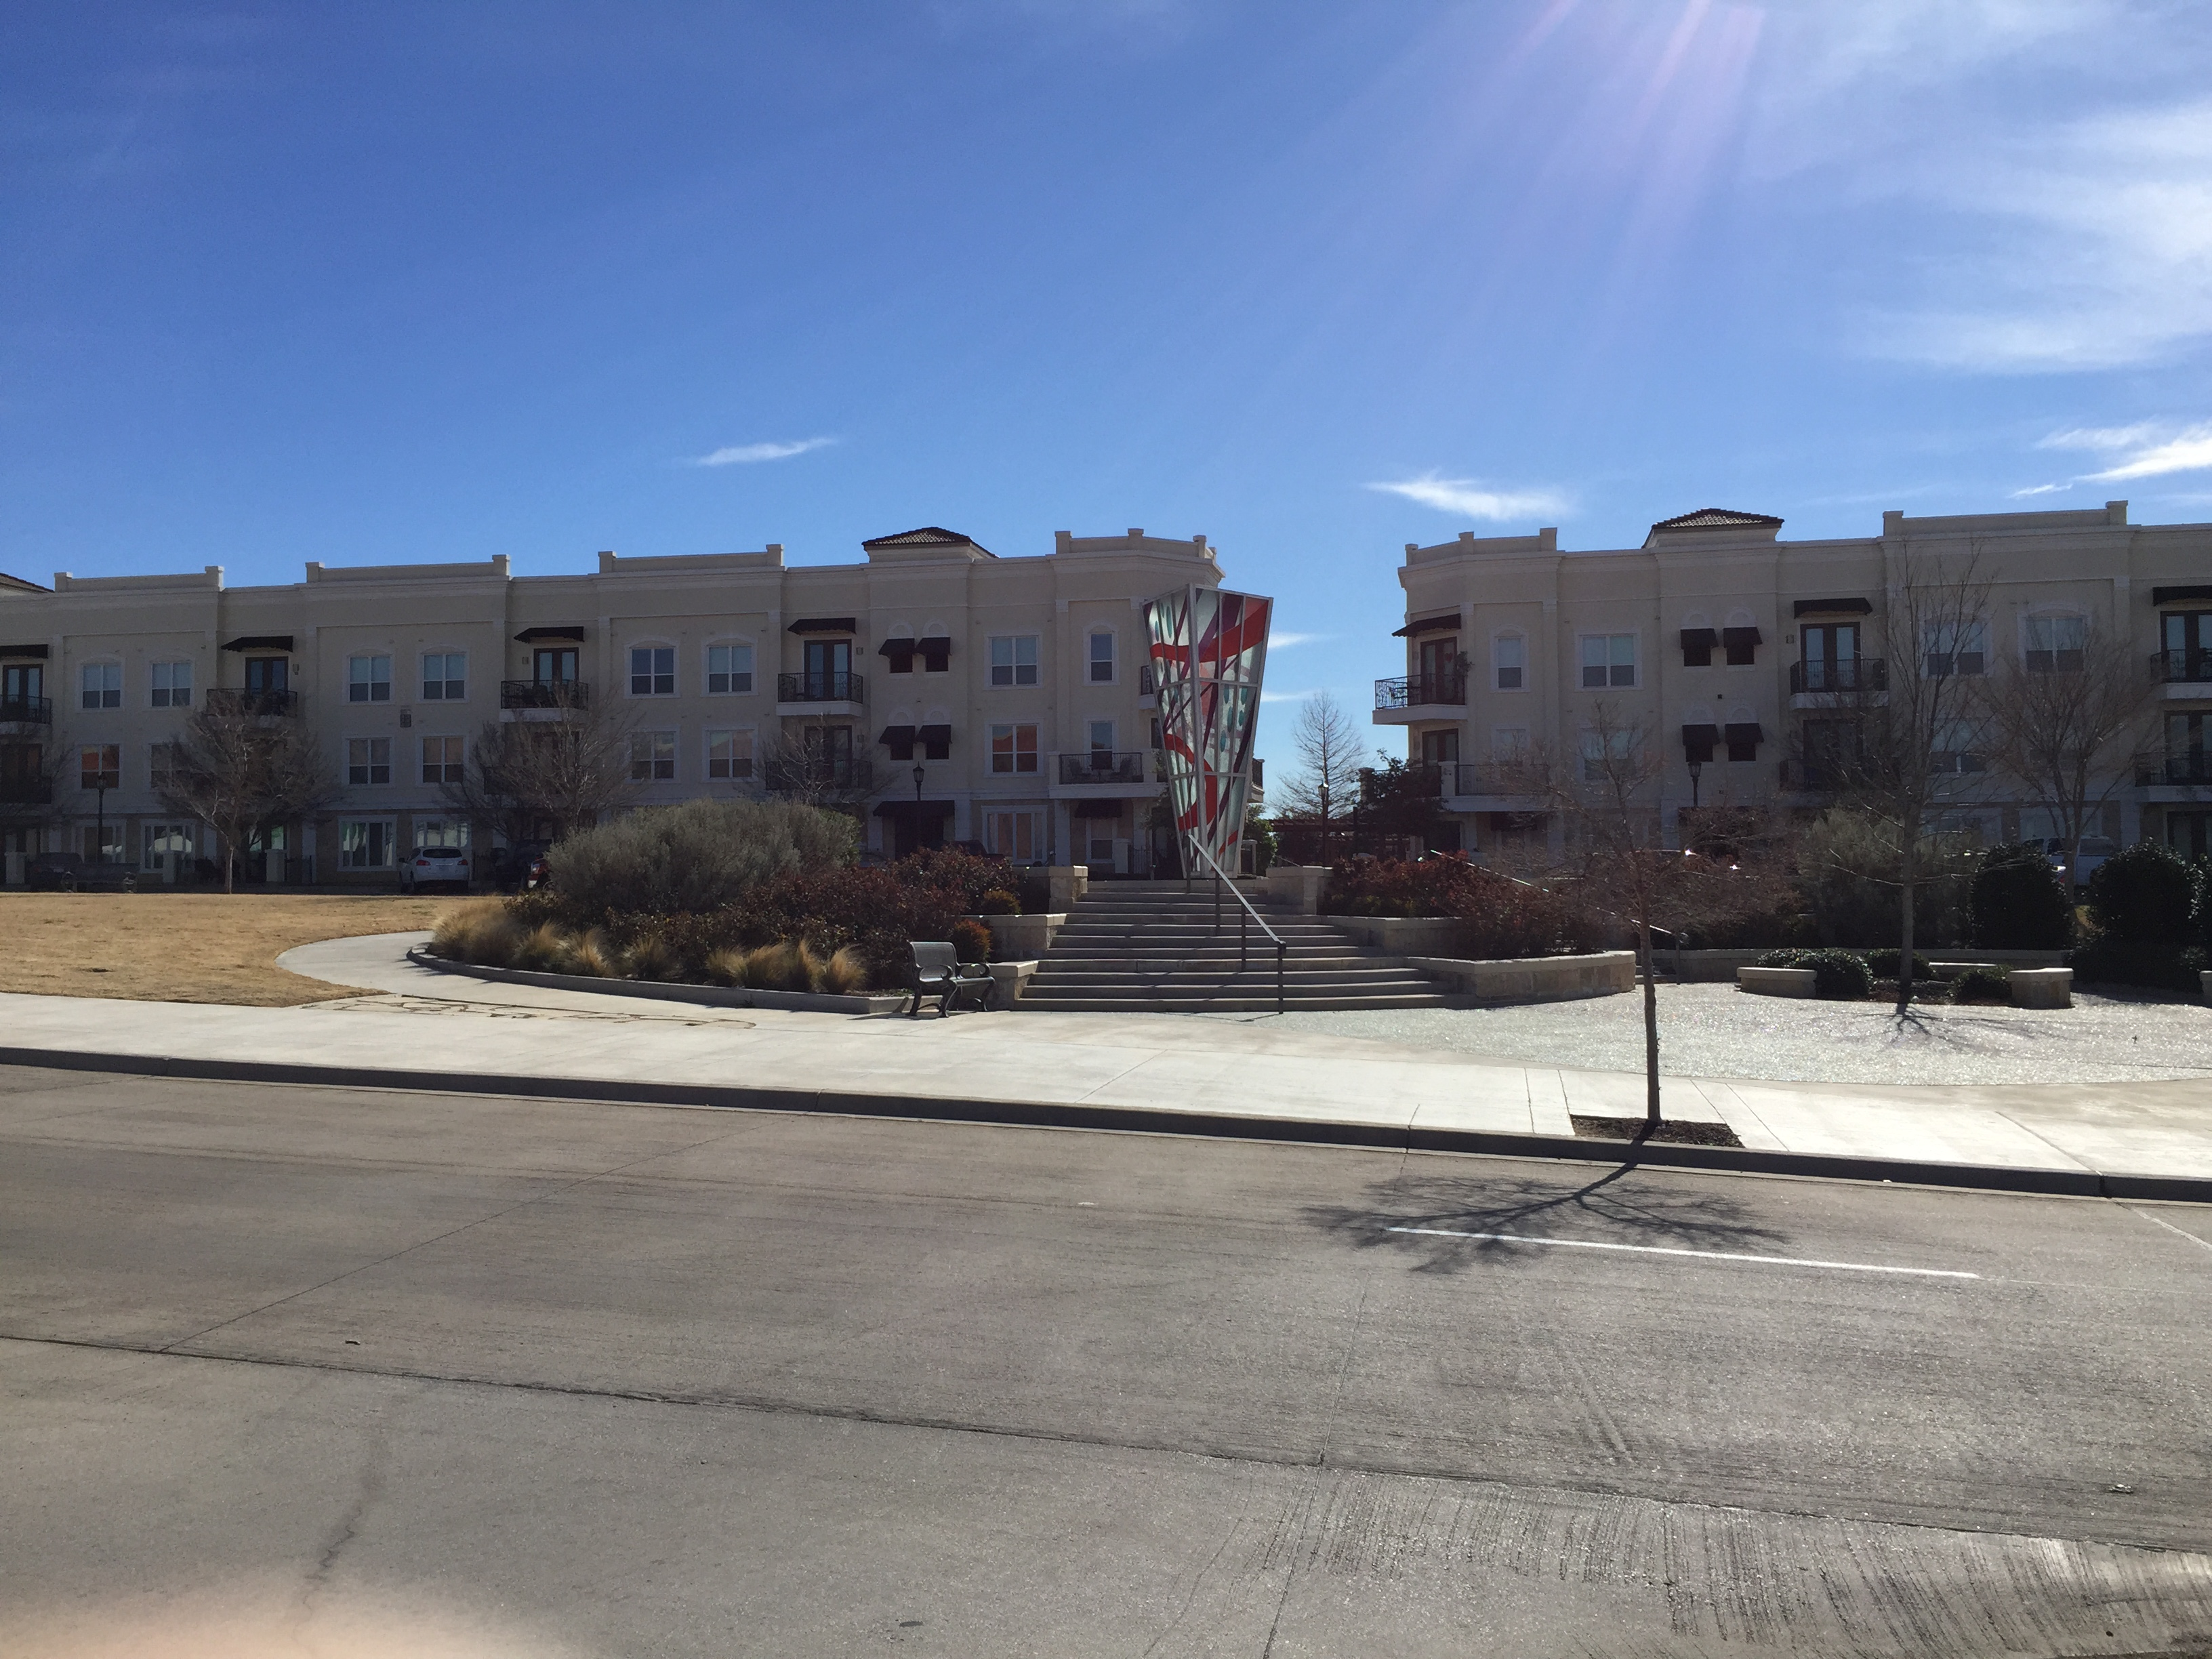 2015-01-29 Stormy Plaza (iPhone pics) (22).JPG